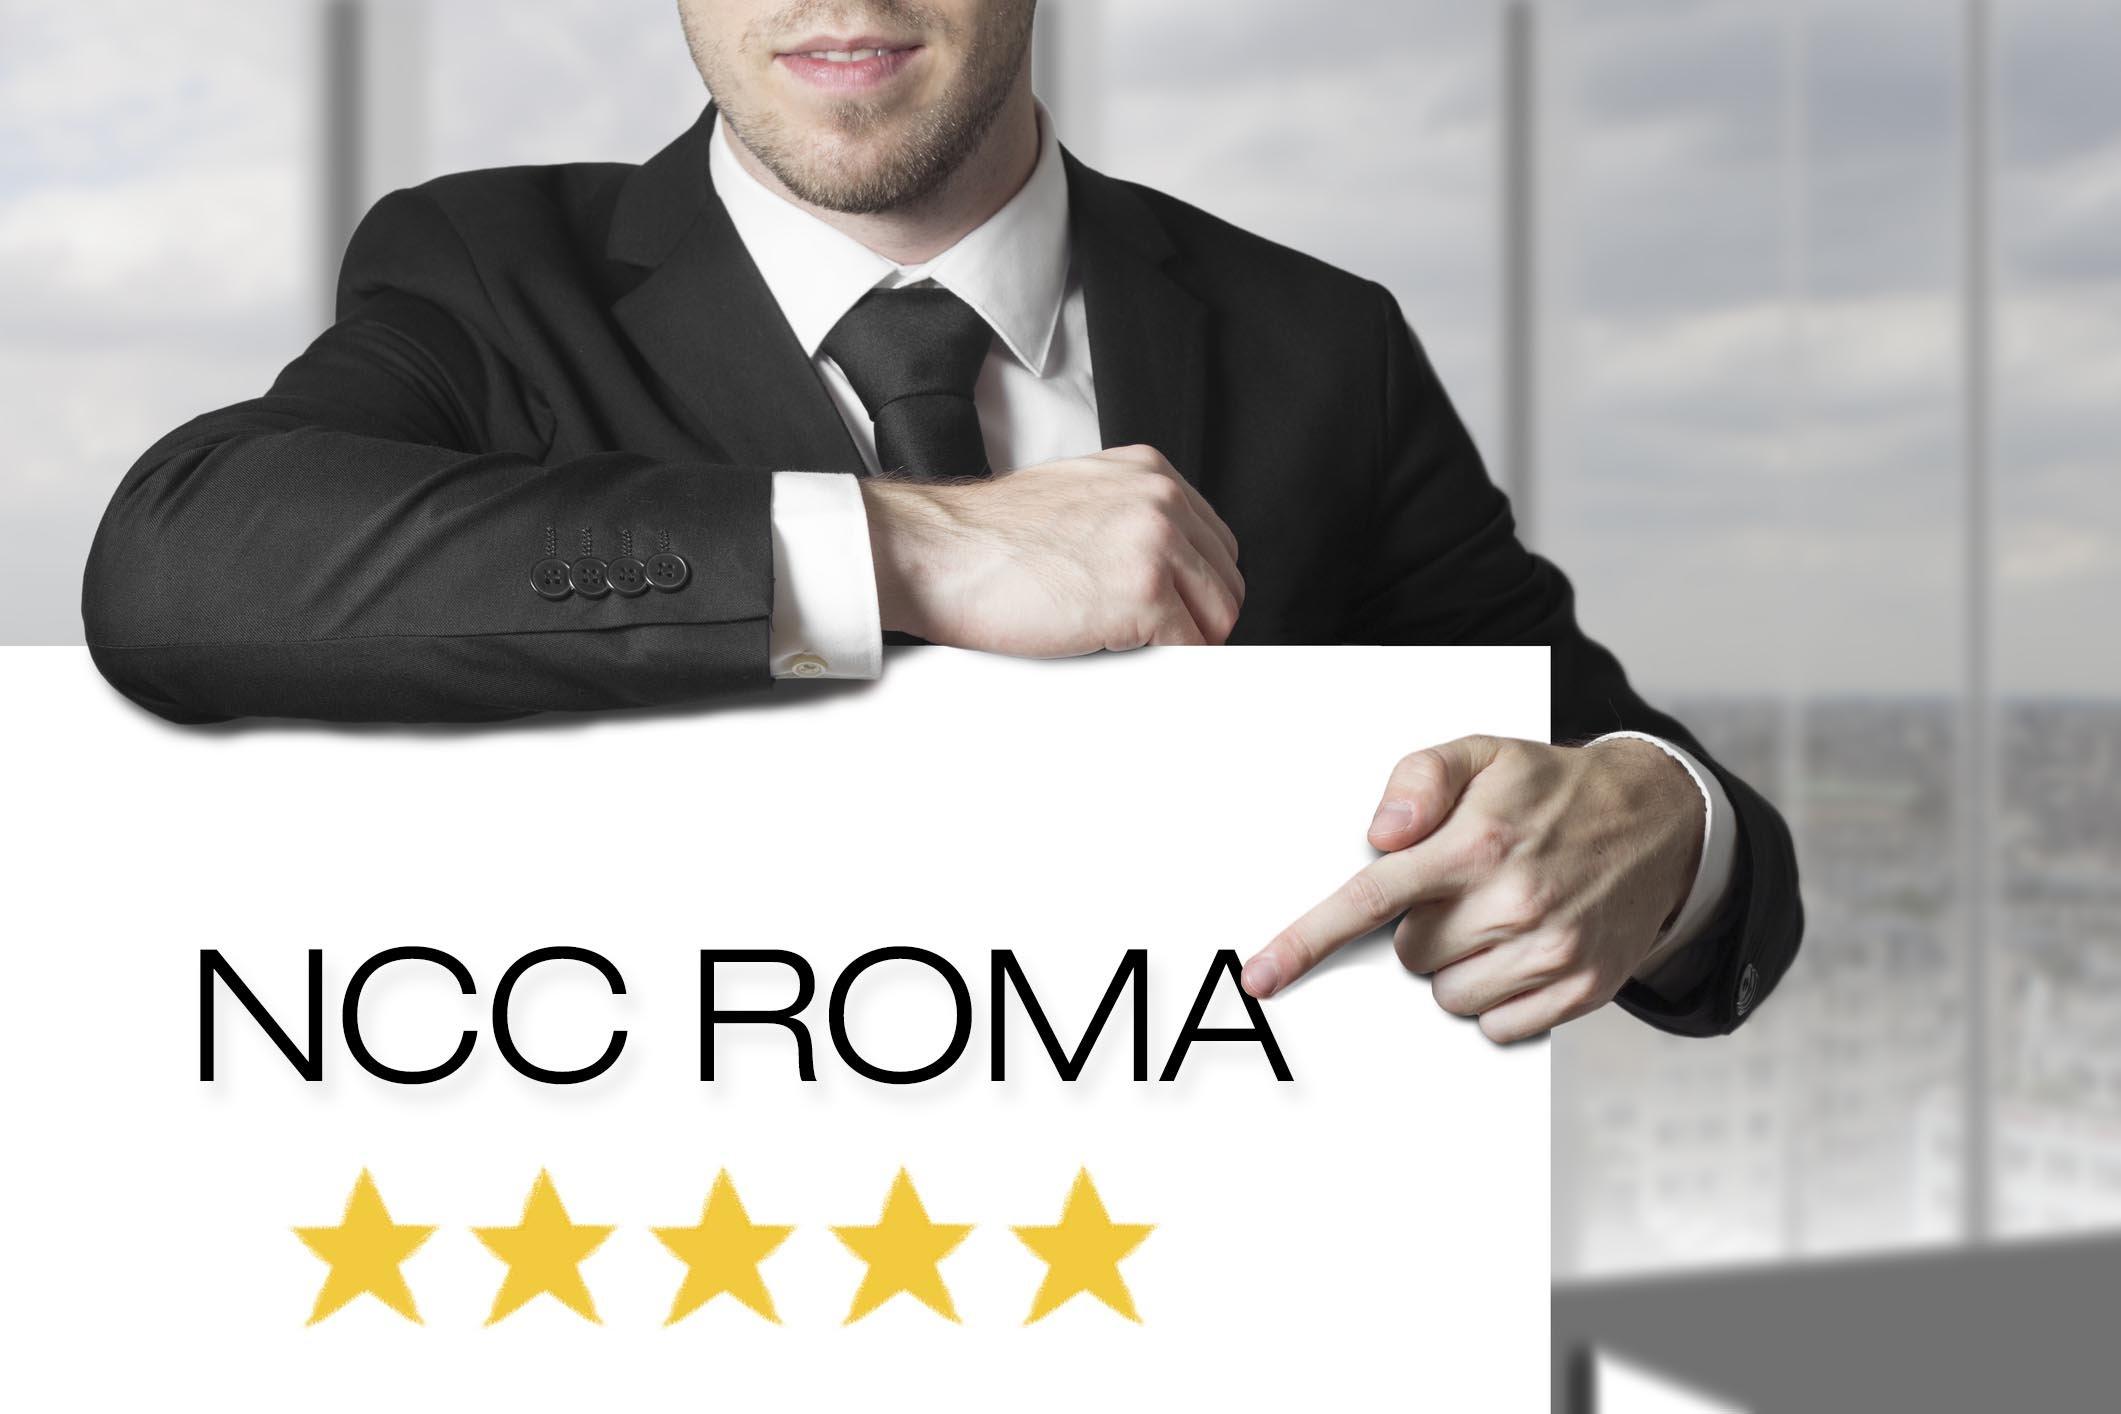 Ncc Roma